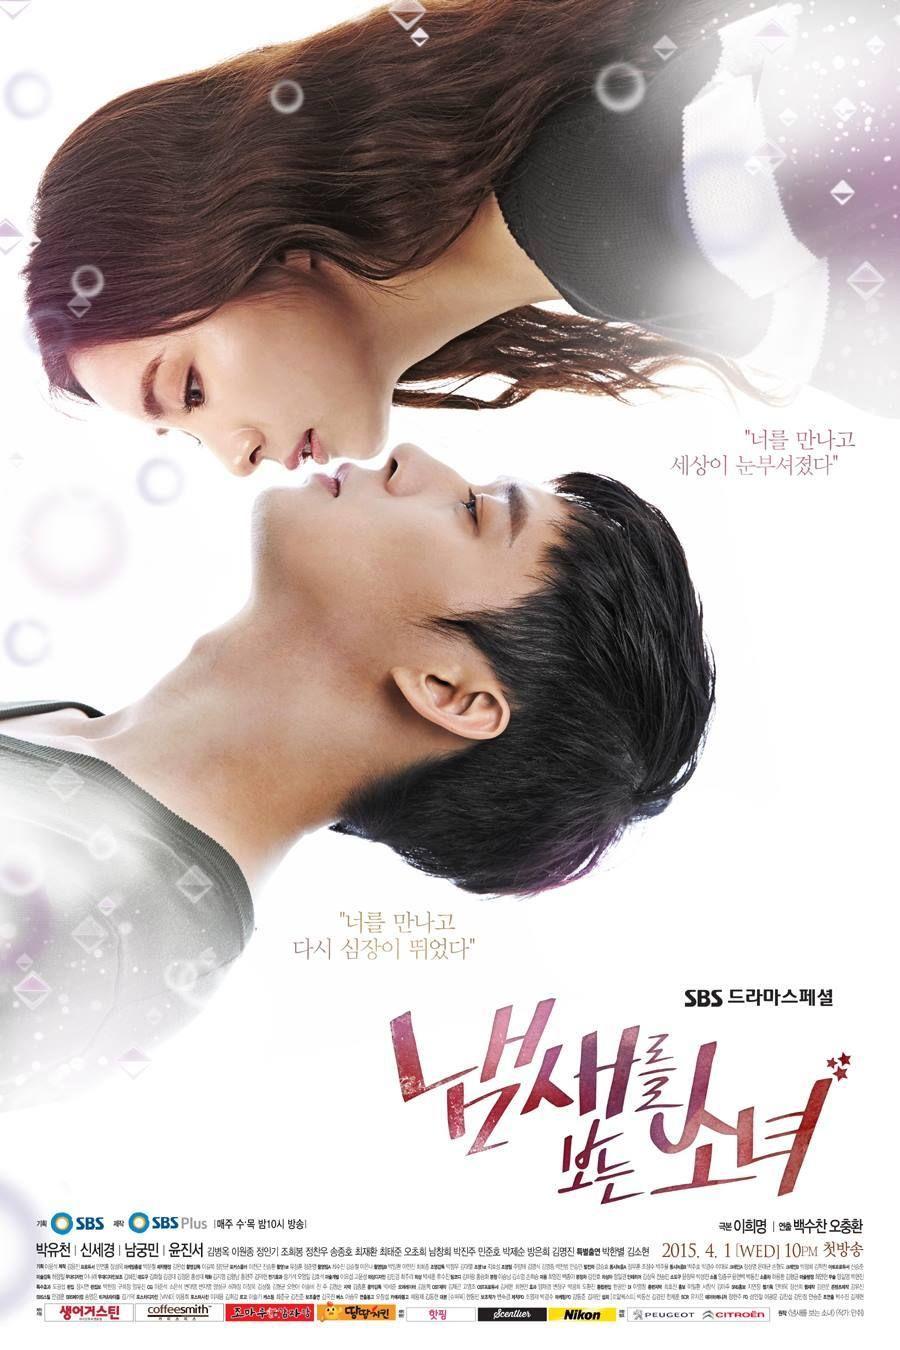 The Girl Who Sees Smells | Park Yoochun and Shin Se-kyung